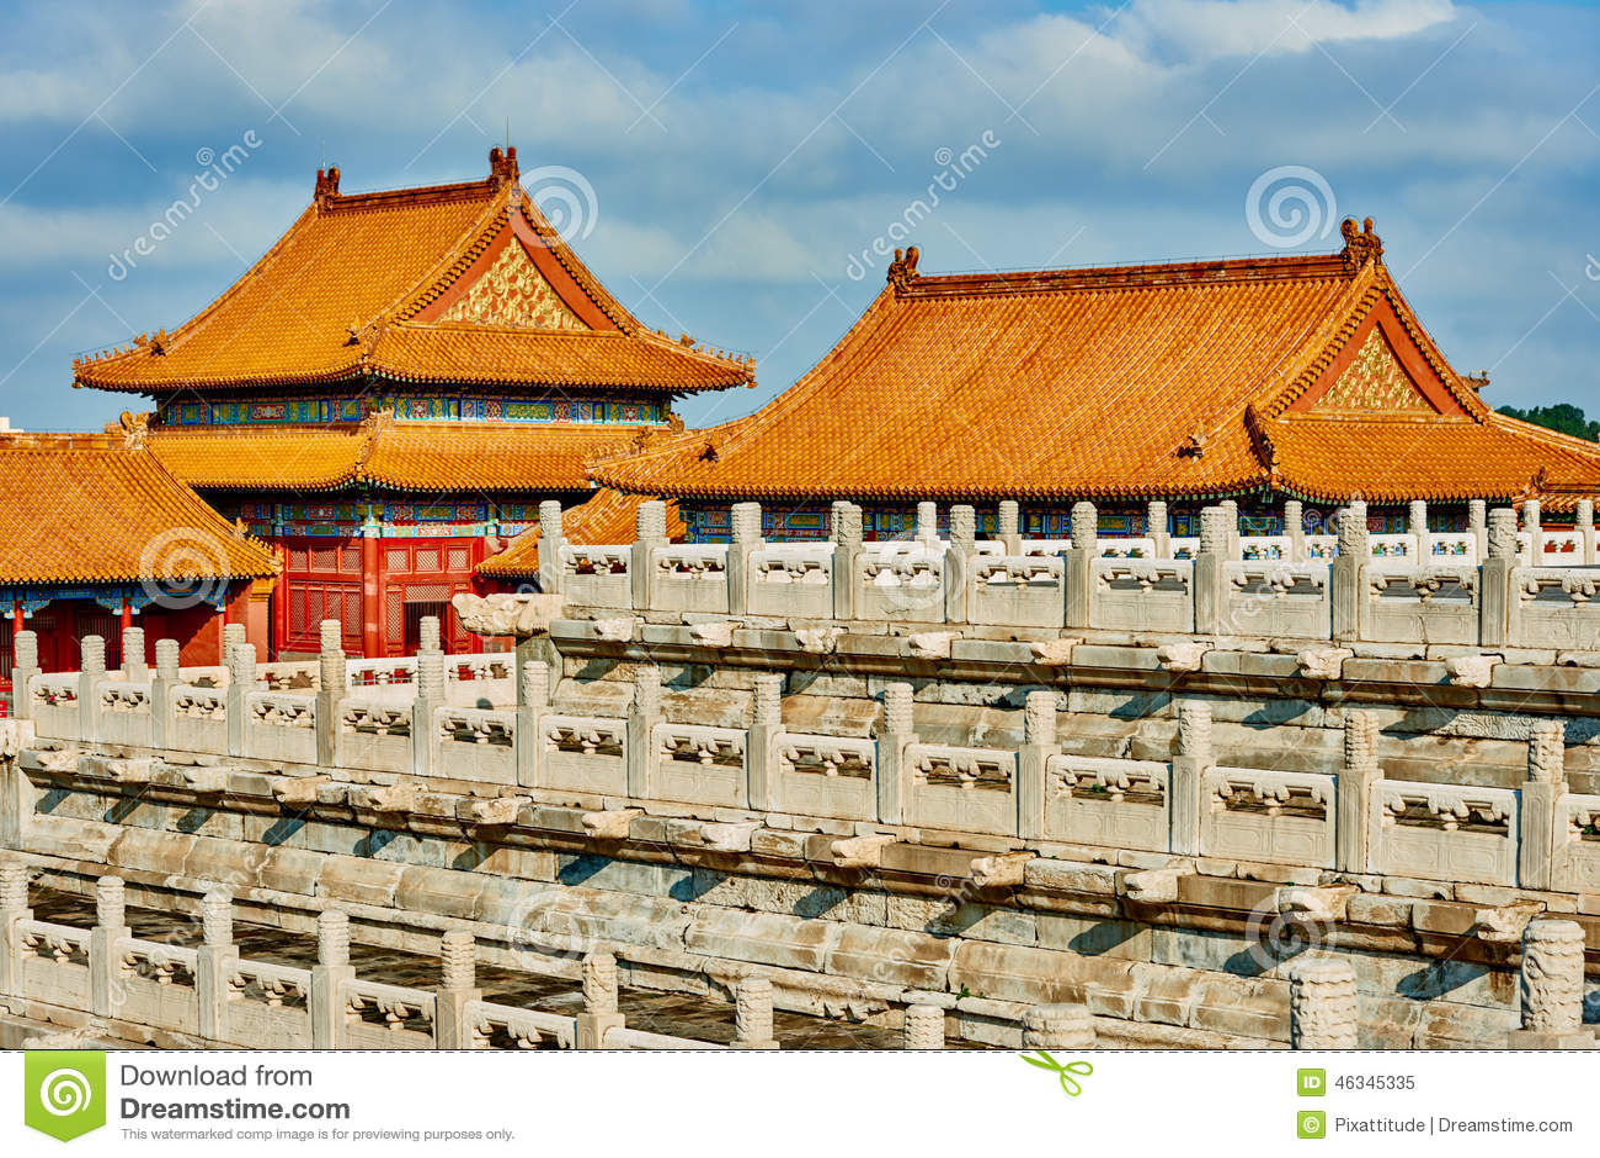 CHINA - CIRCA JANUARY 2014: Asia, China, Beijing ...  |Imperial Palace Forbidden City Beijing China